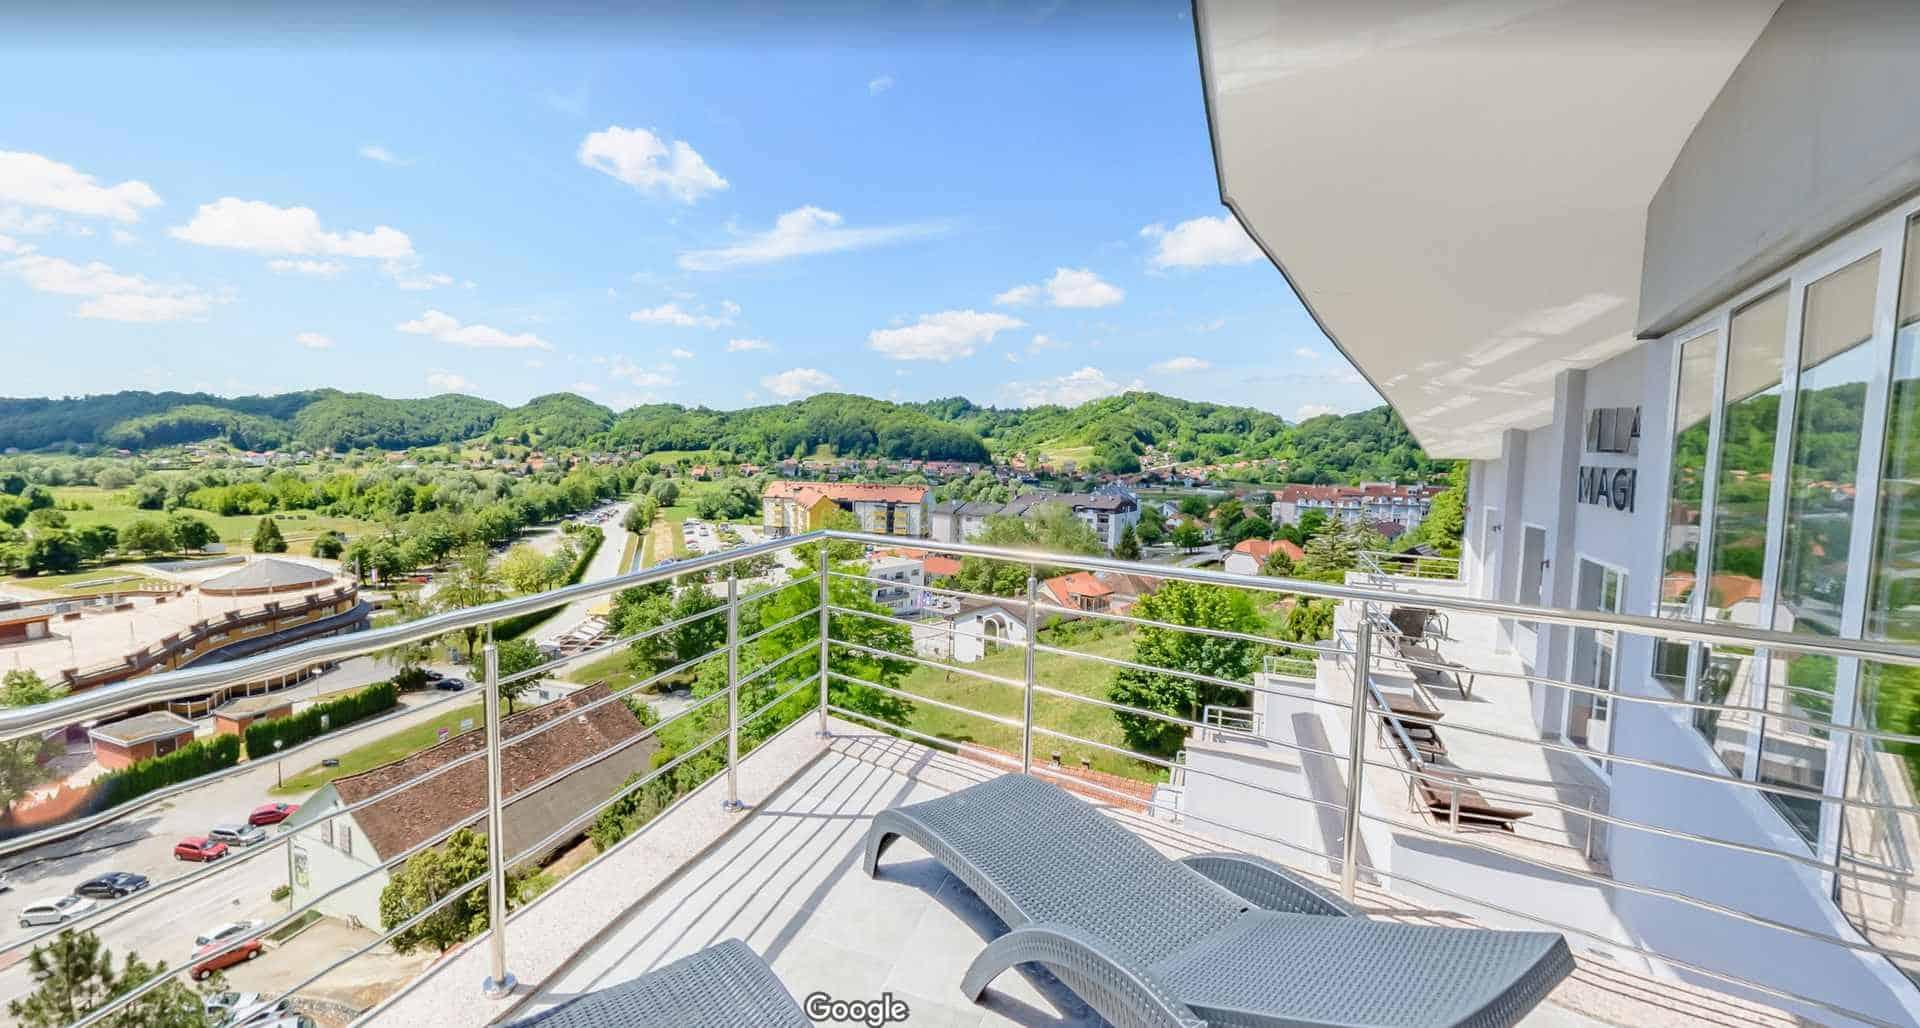 Virtualna šetnja - Spa & Wellness - Hotel Villa Magdalena, Krapinske Toplice